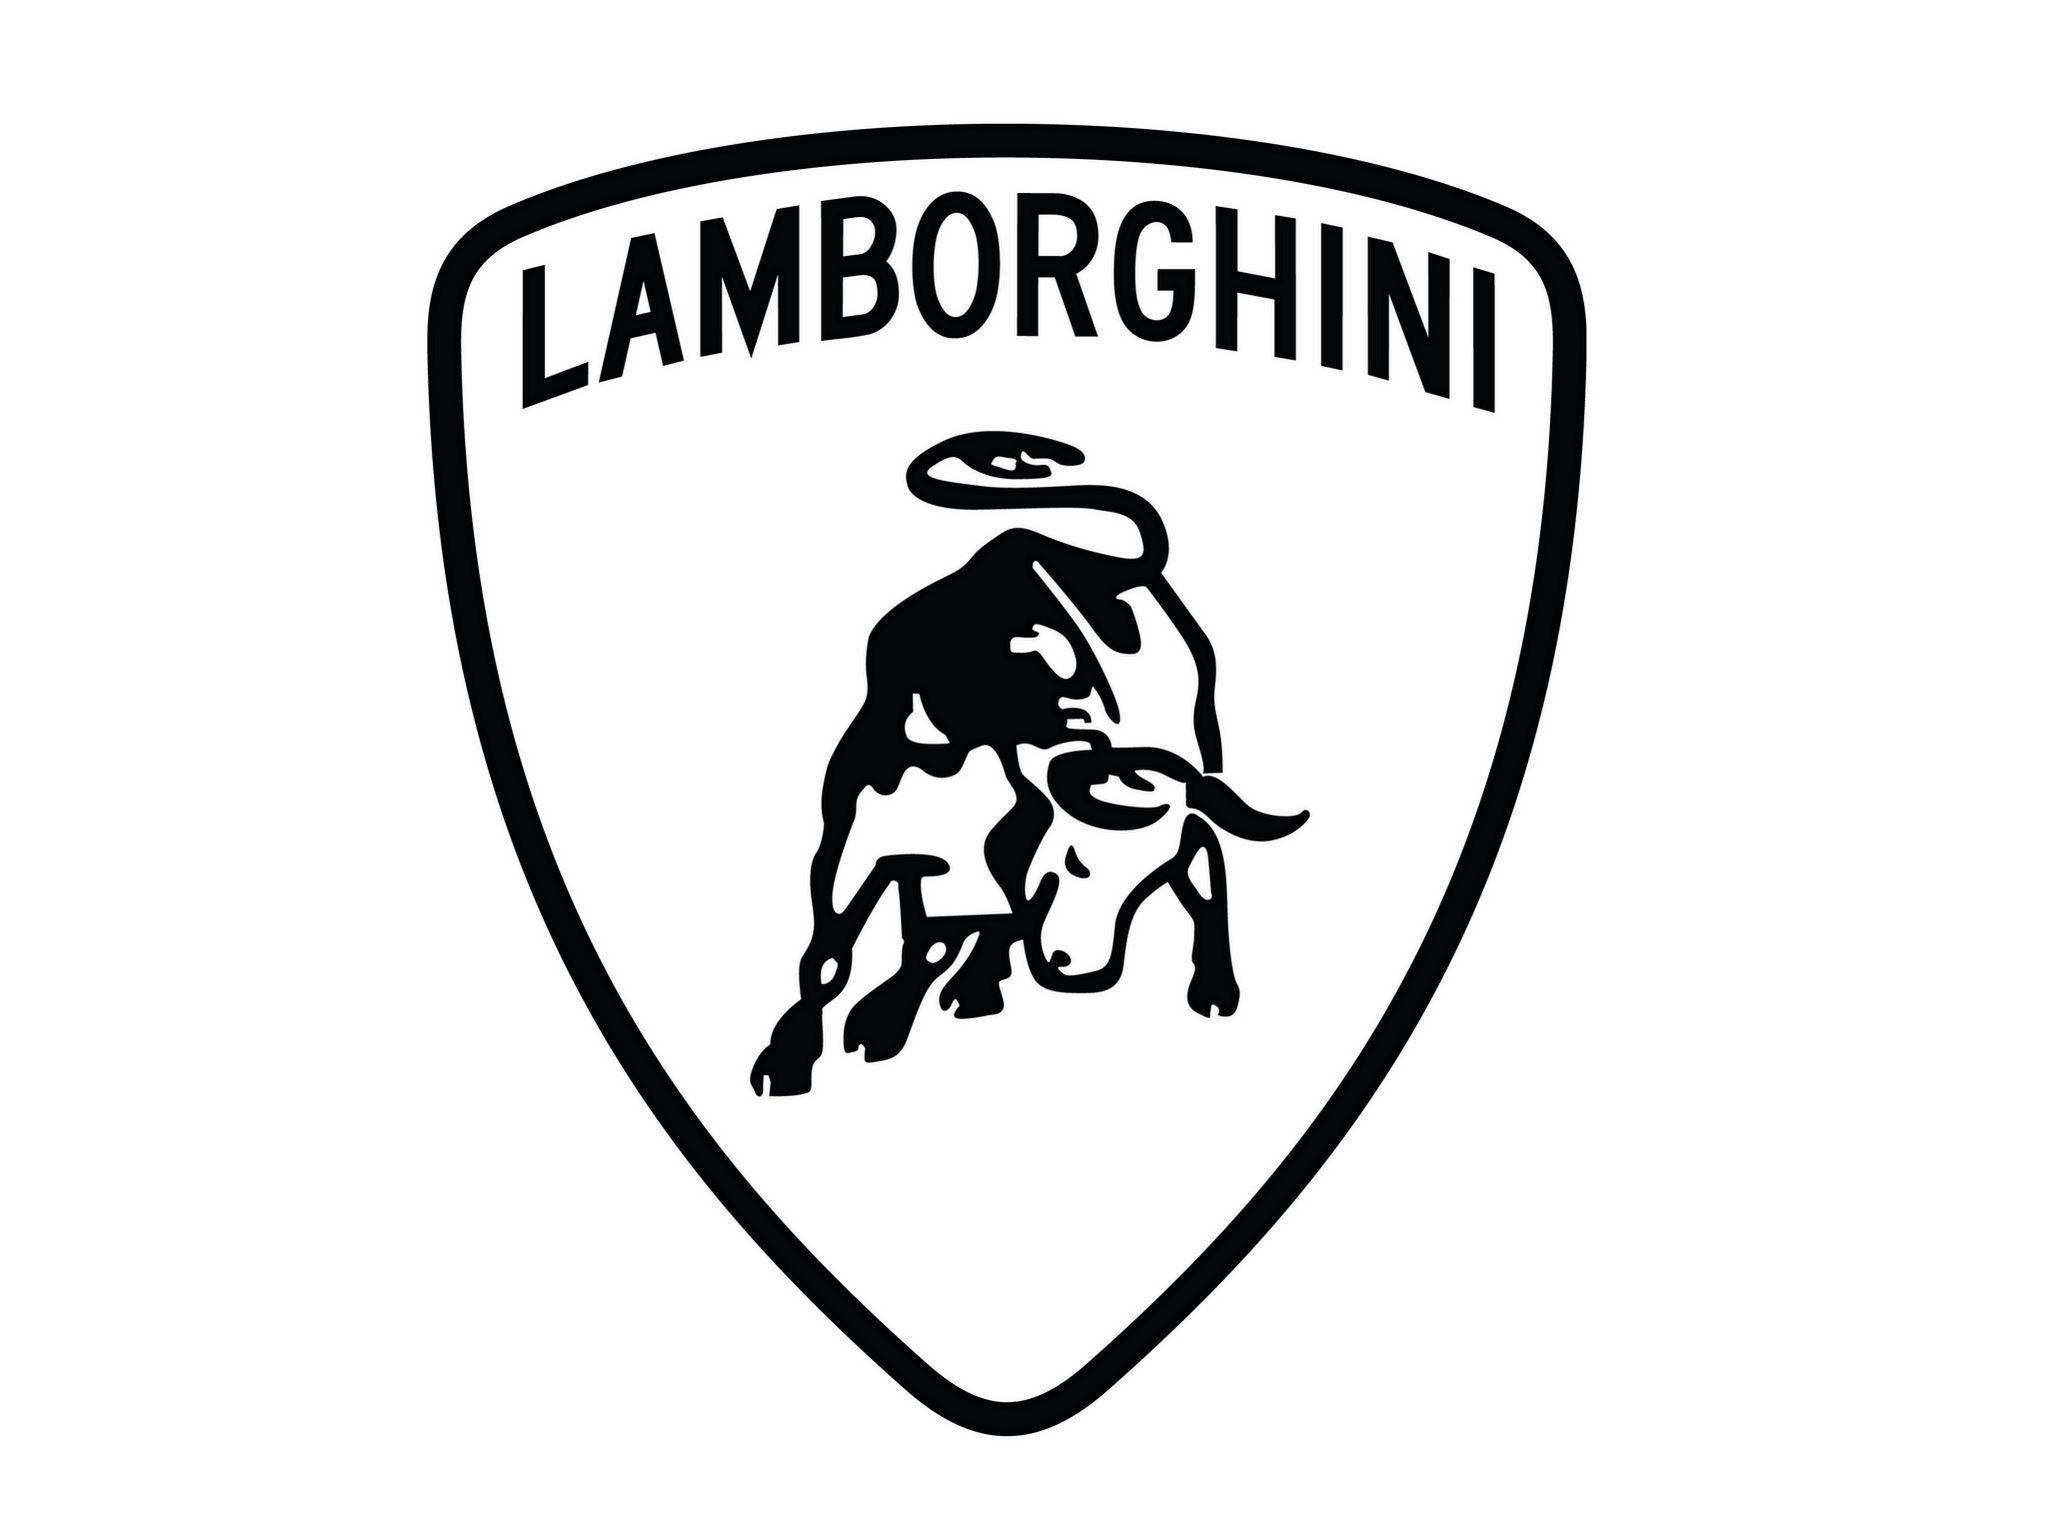 Lamborghini Car Logo 1024x576 Hd 16 9 No 938 Wallpapers Black